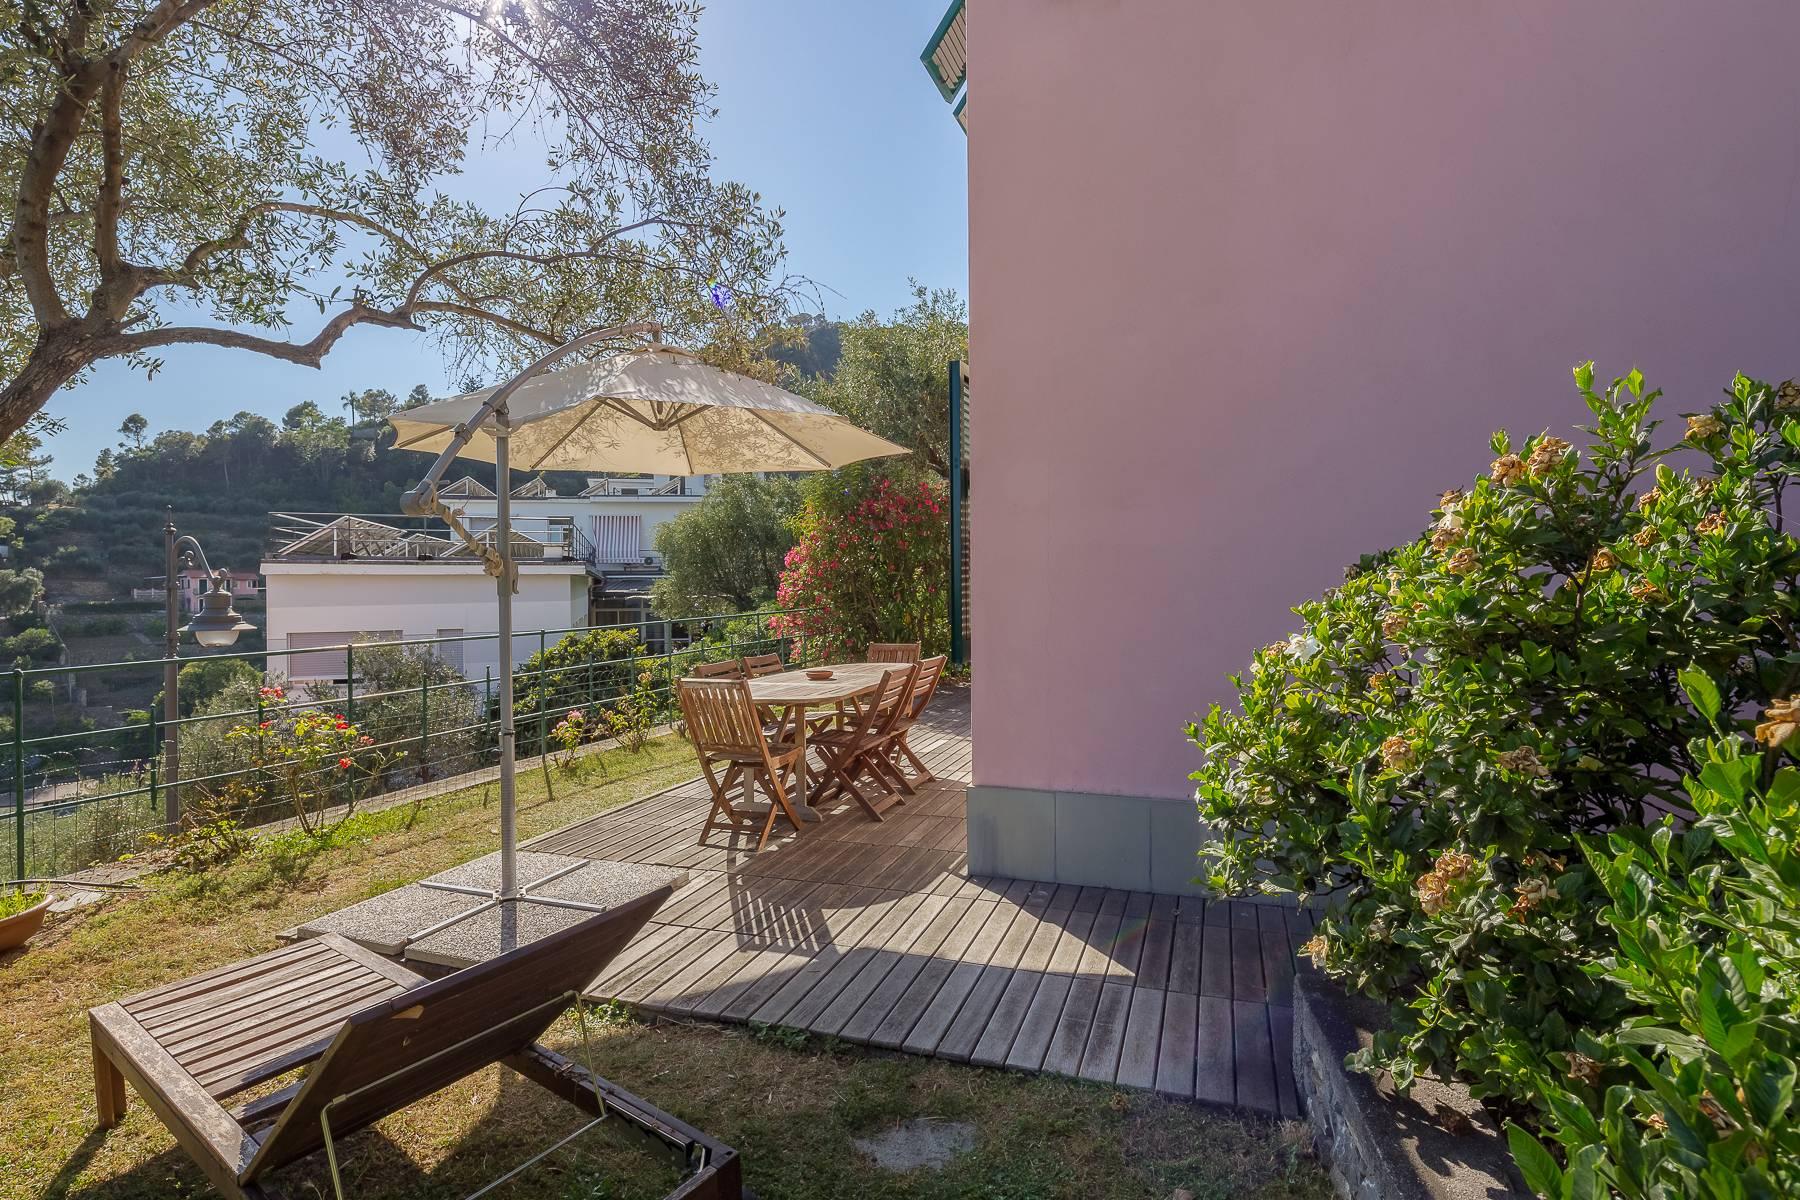 Casa indipendente in Vendita a Zoagli: 5 locali, 100 mq - Foto 5